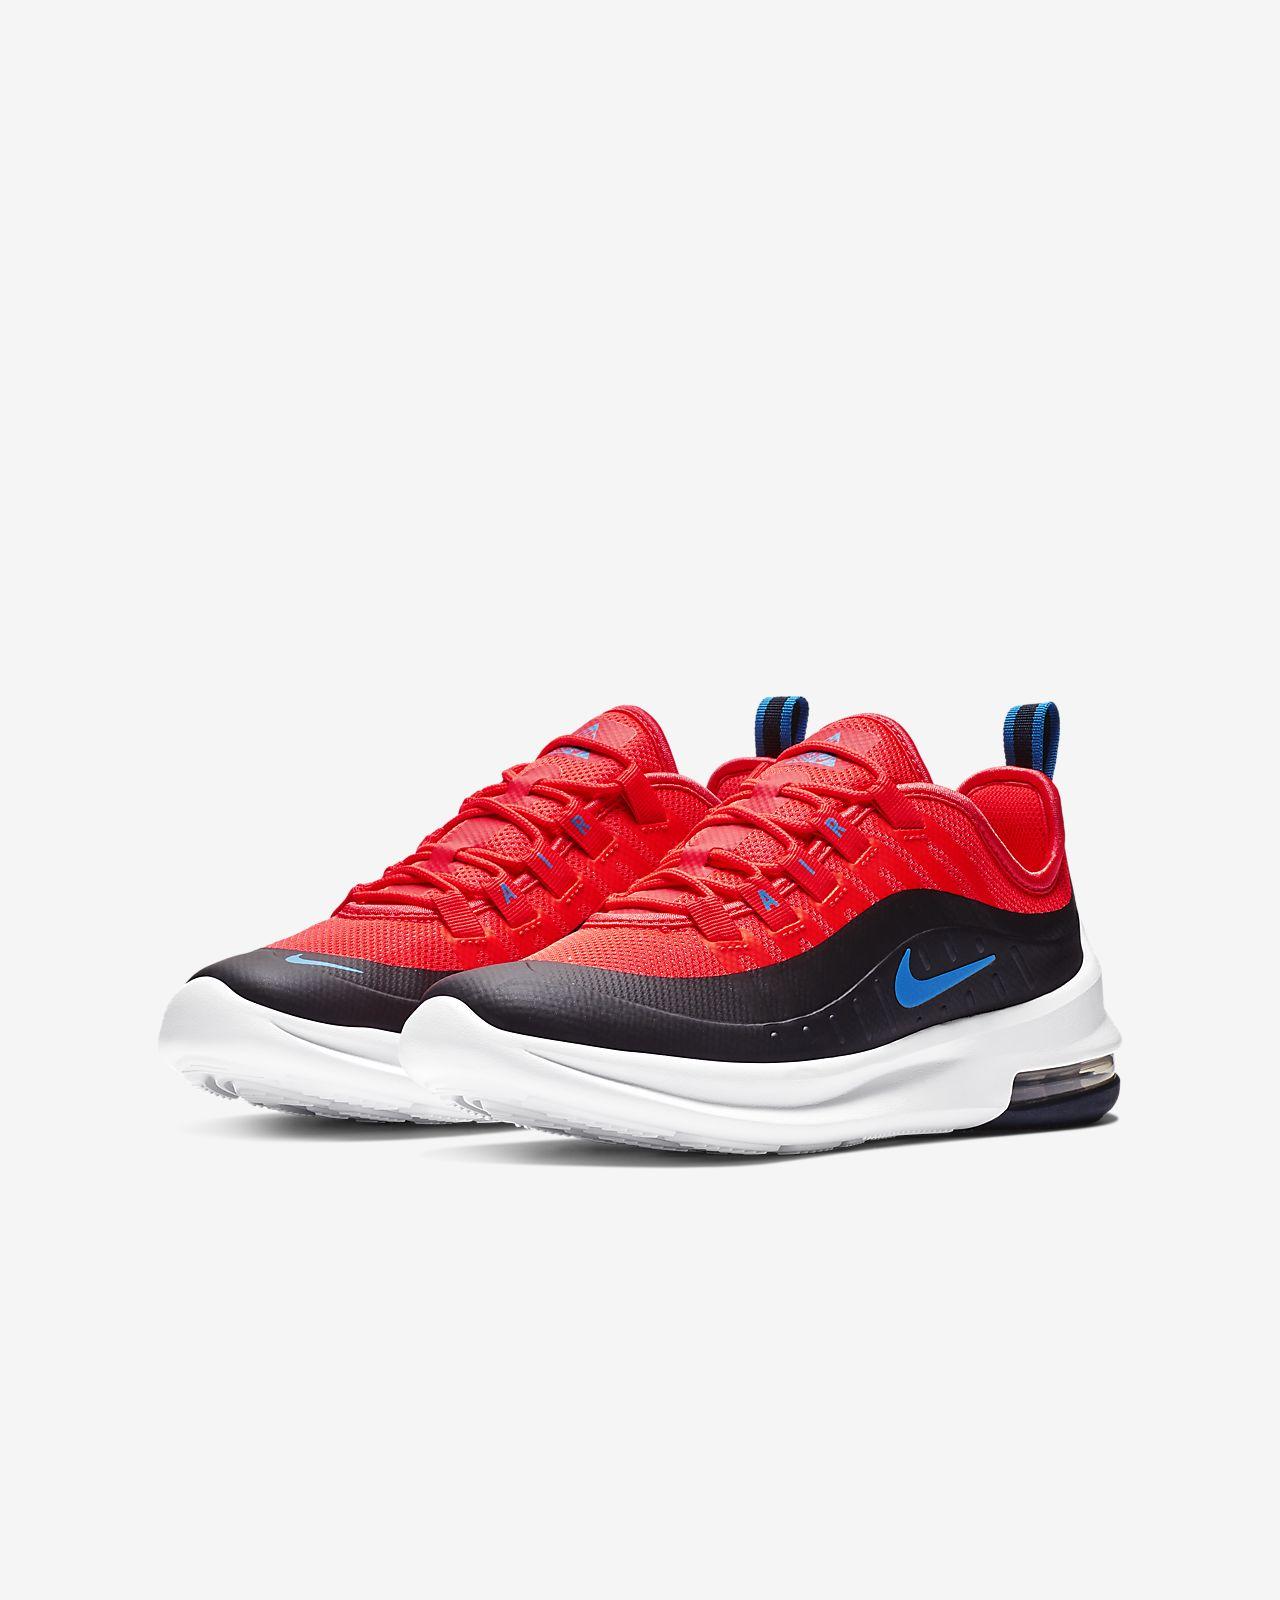 timeless design 44f9e 00ac1 ... Nike Air Max Axis Older Kids  Shoe